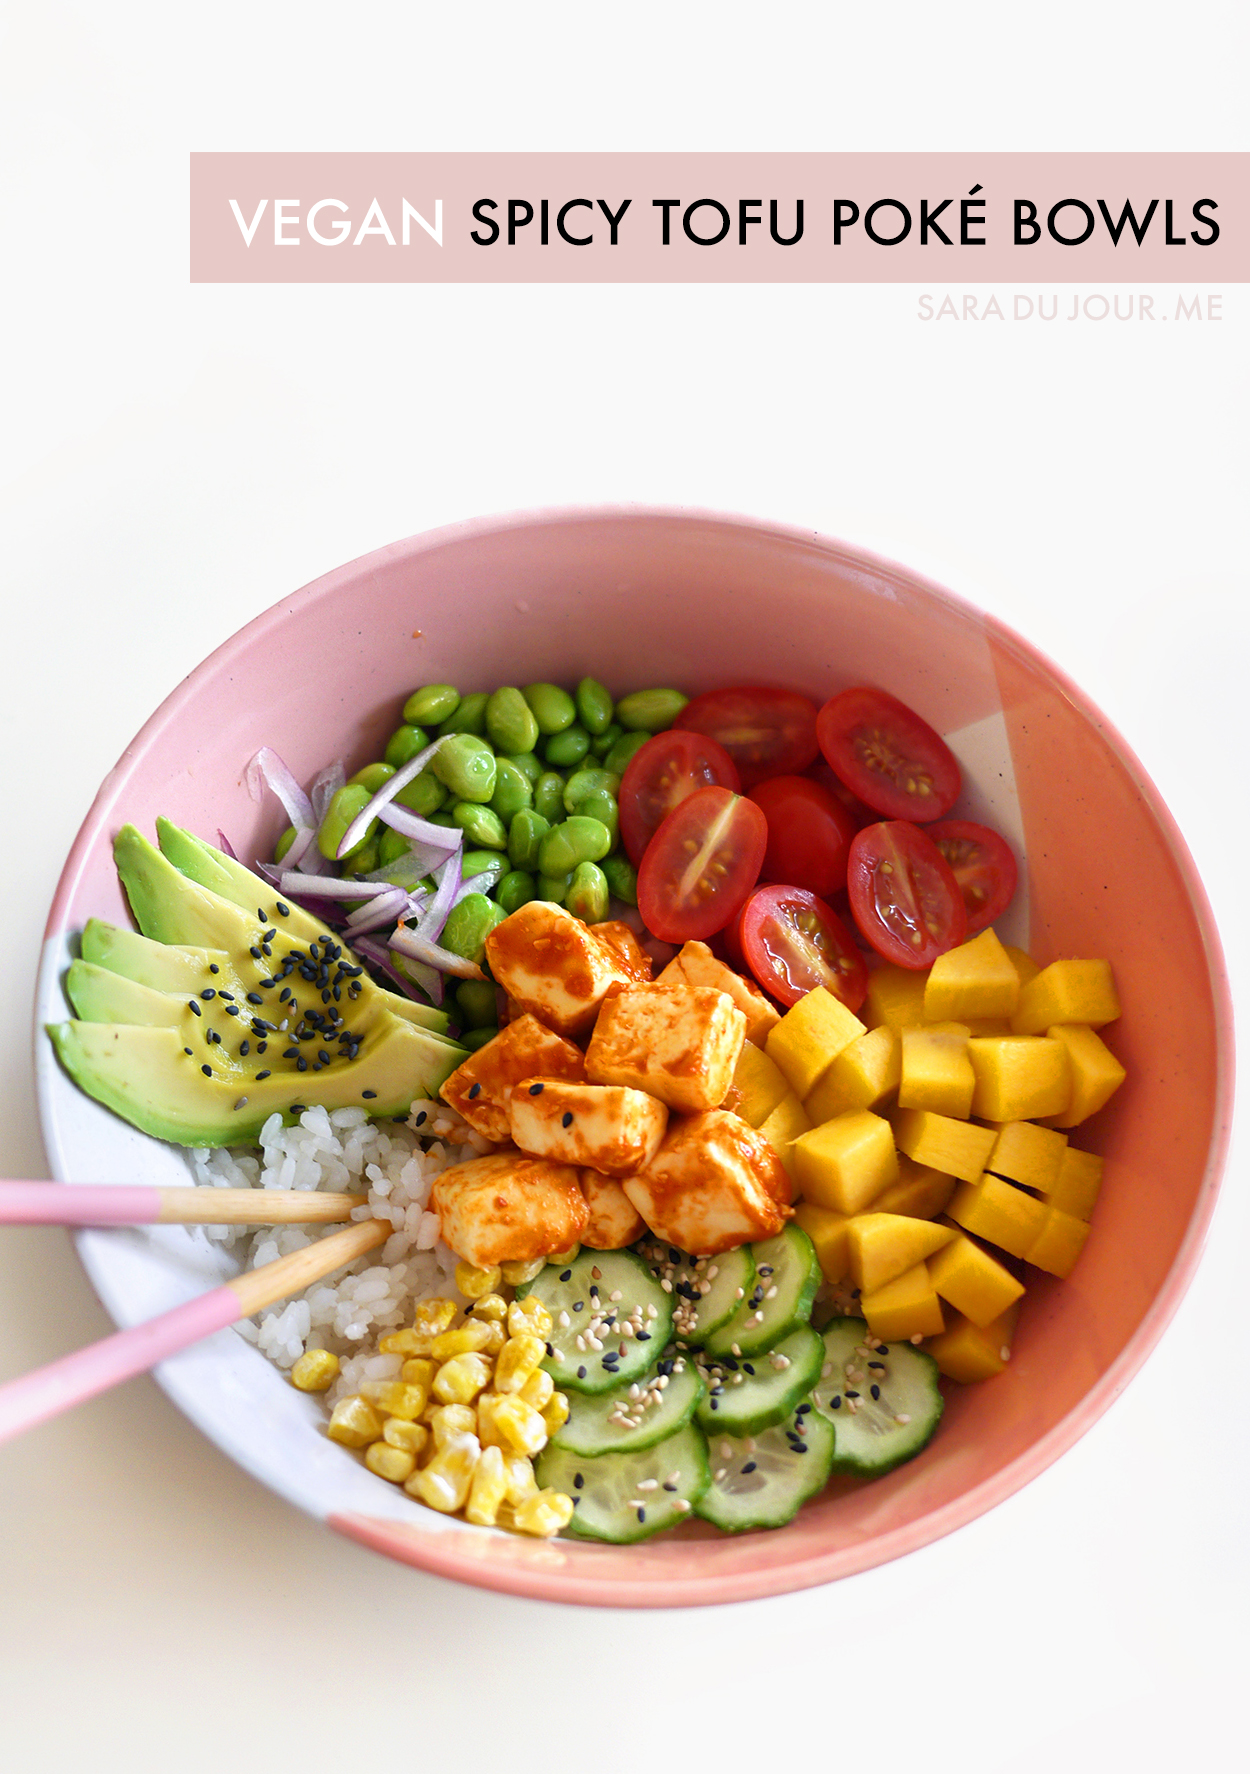 Vegan Spicy Tofu Poke Bowls Recipe | Sara du Jour